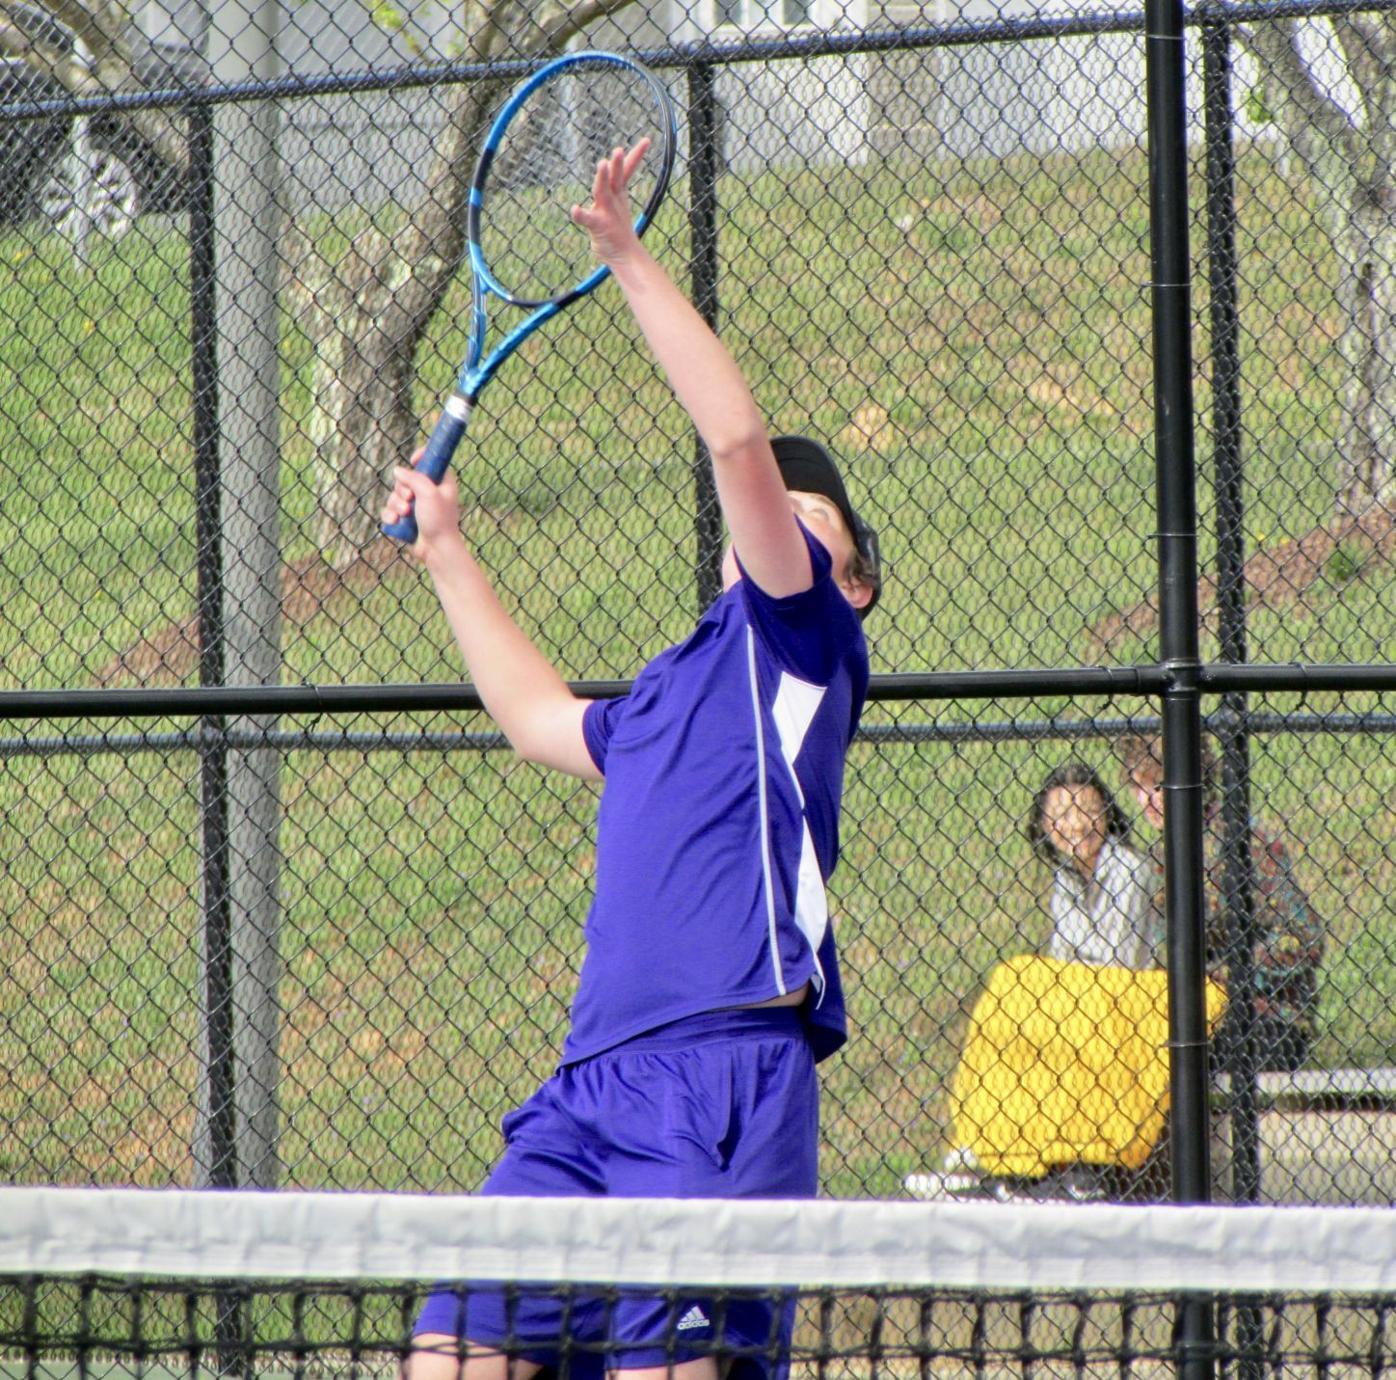 Jake Reavis 4/14 serve